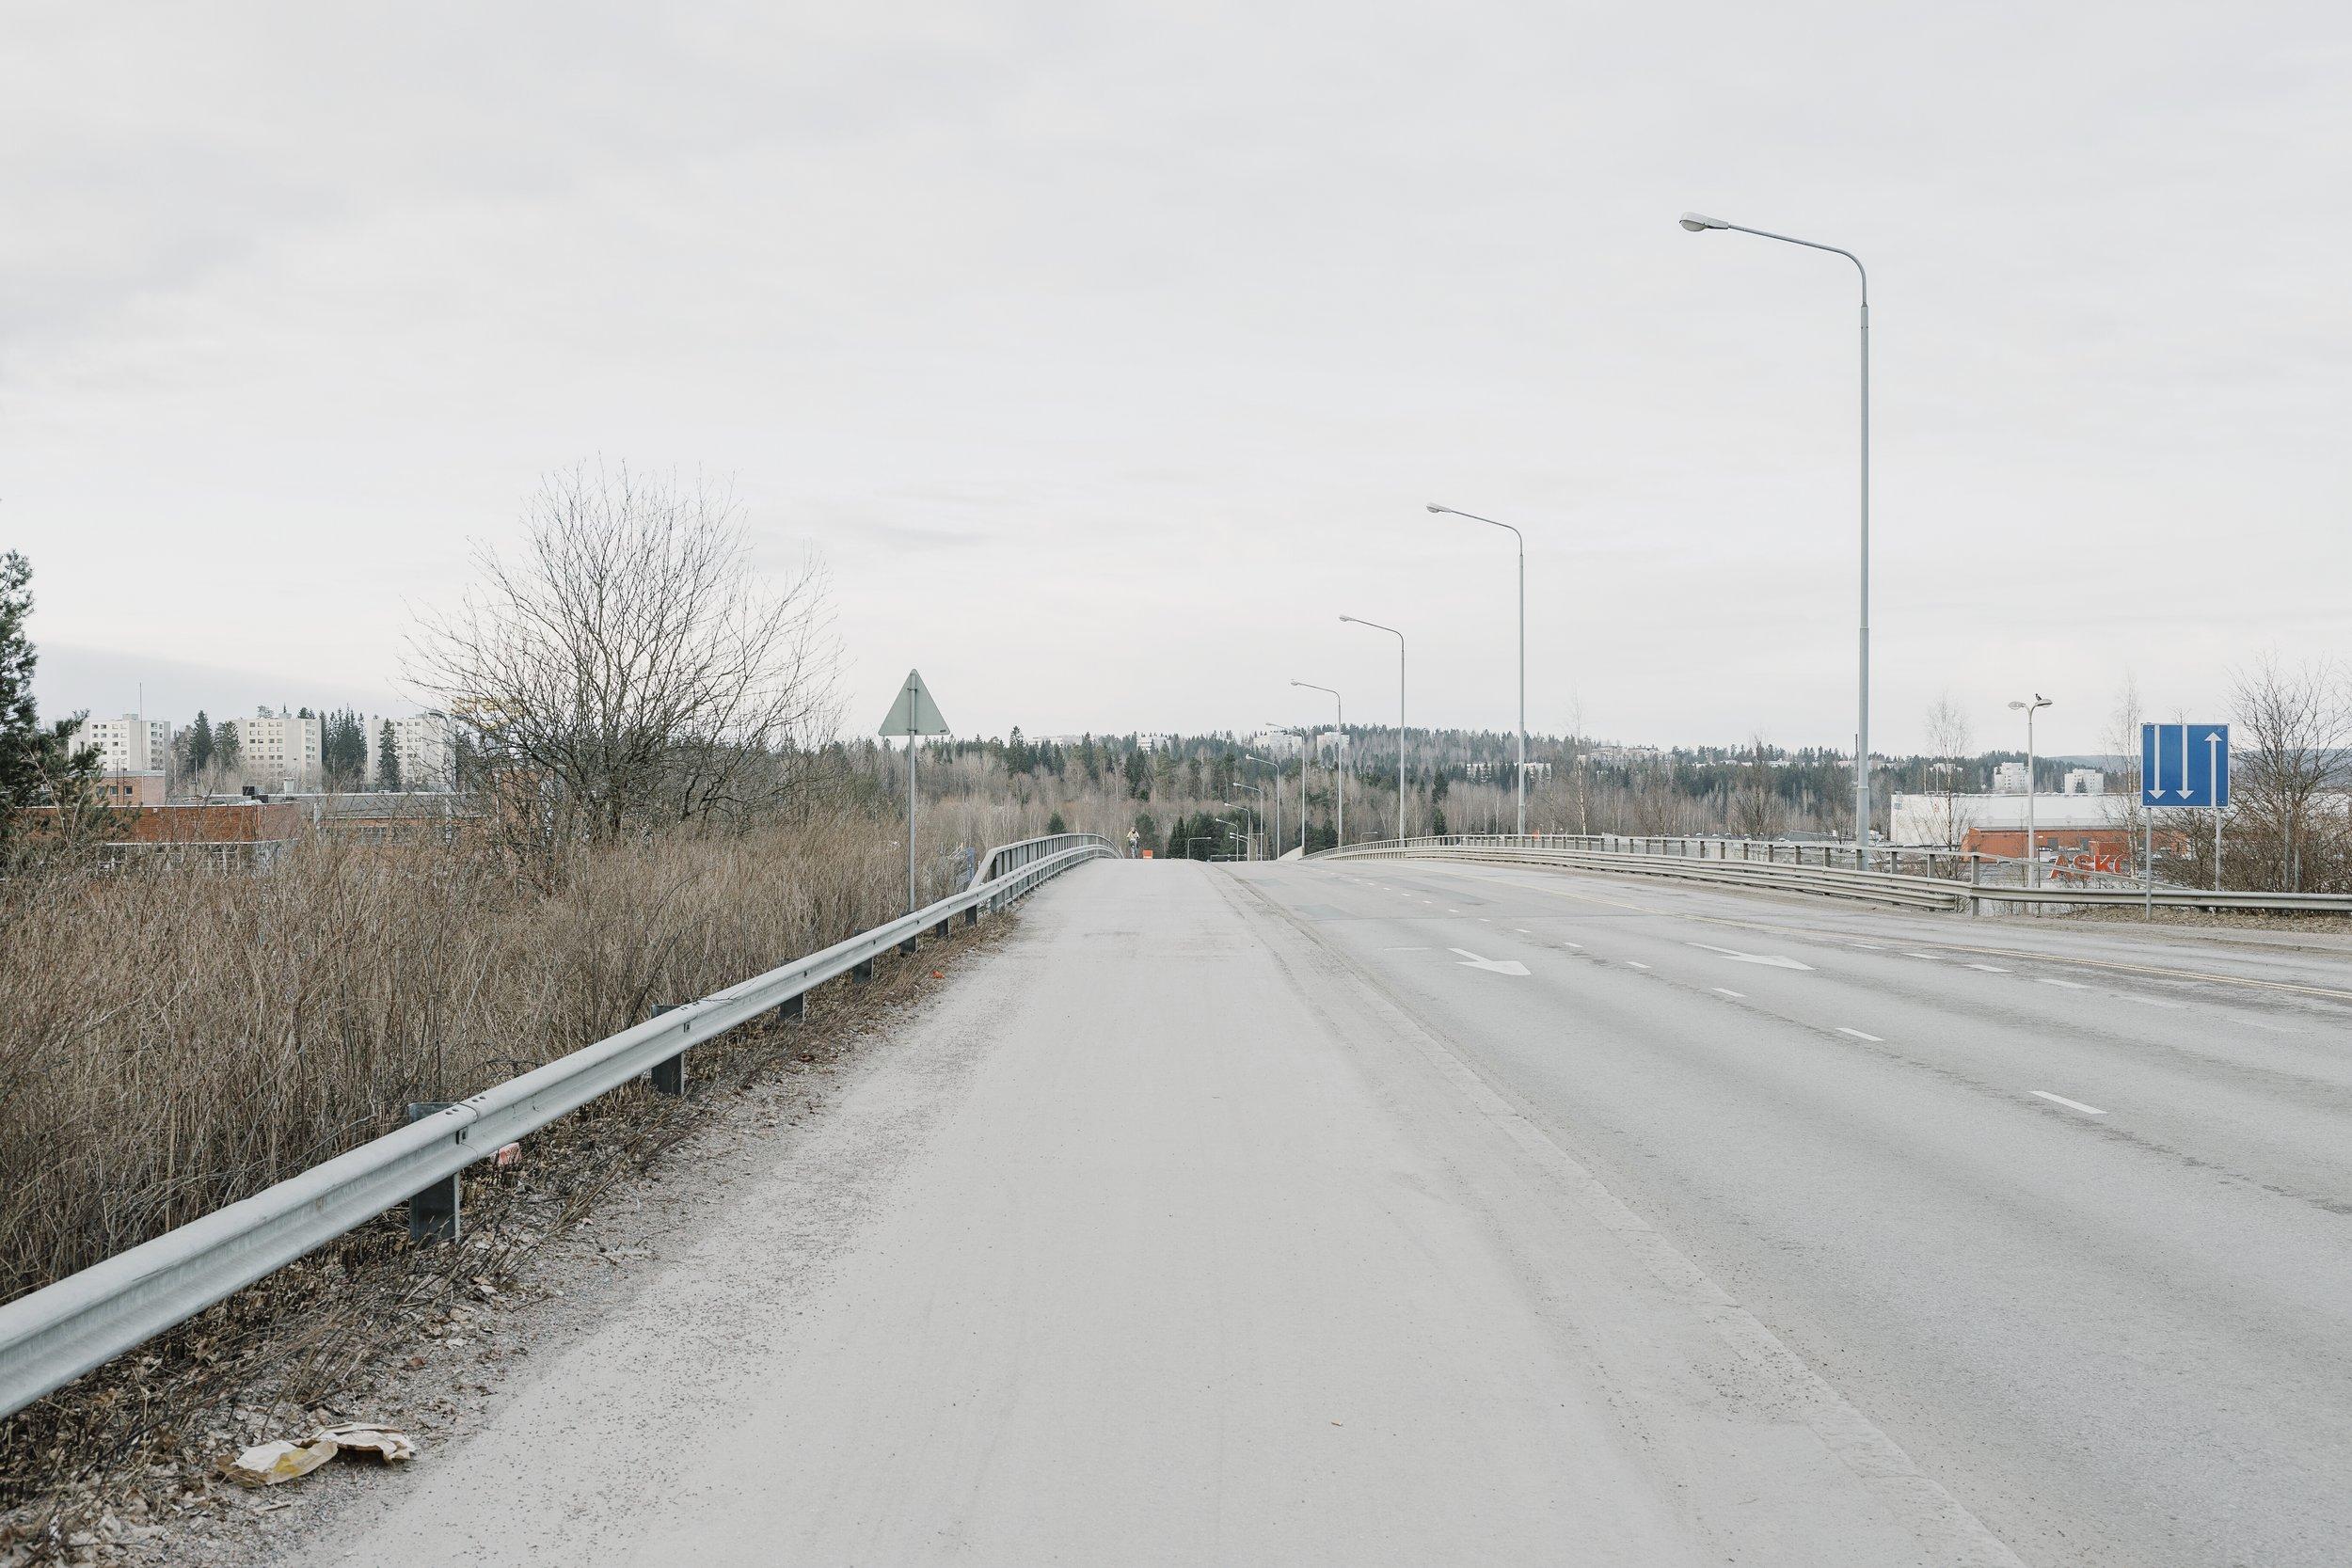 Lahti, Finland, April 2017